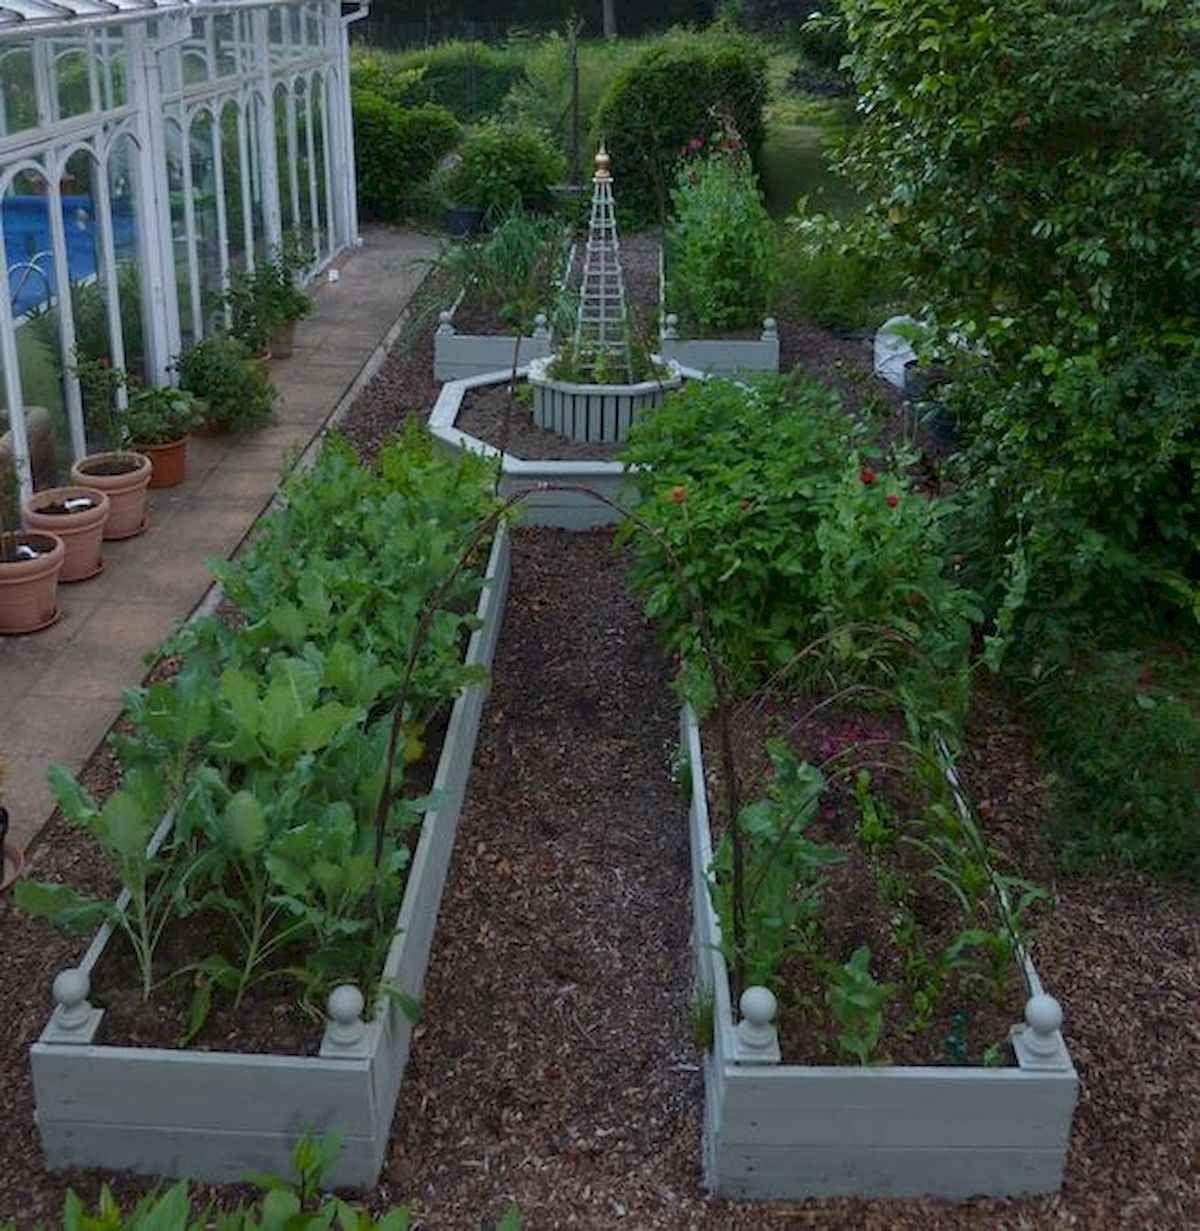 35 Advantageous Small Vegetable Garden Ideas For Your: 35 Stunning Vegetable Backyard For Garden Ideas (24